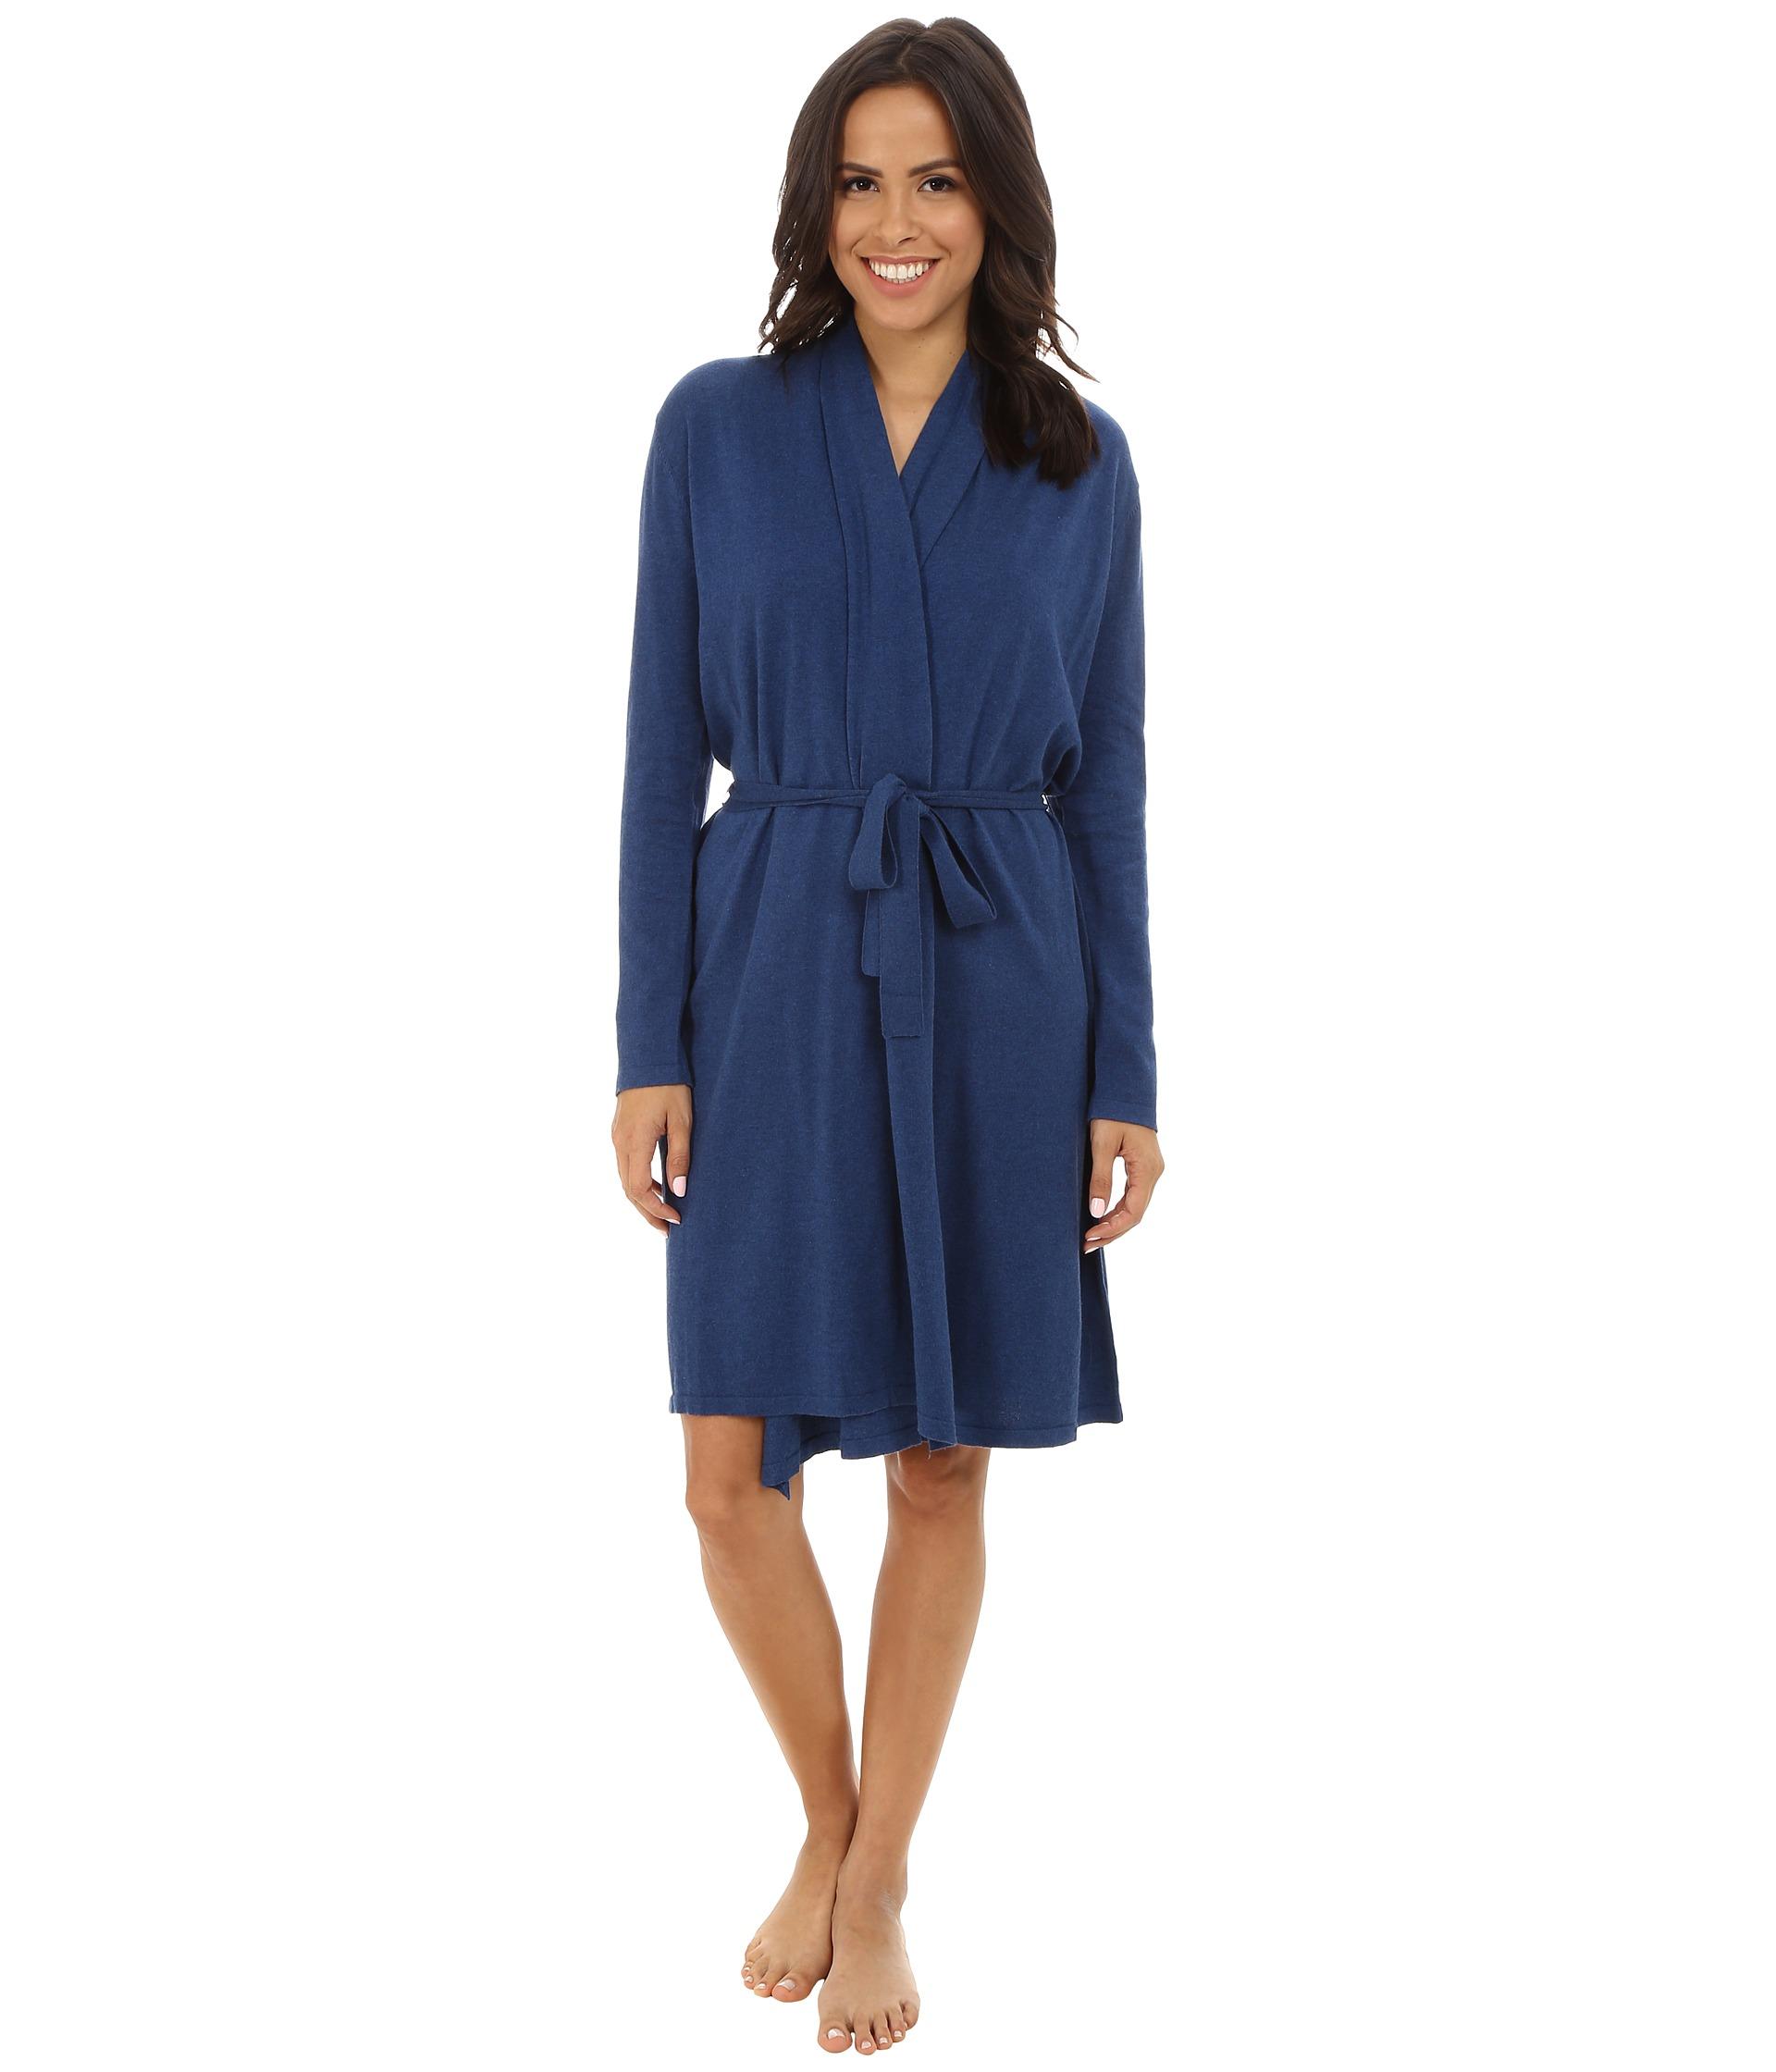 Robe Australia: Uggs Robe Sale